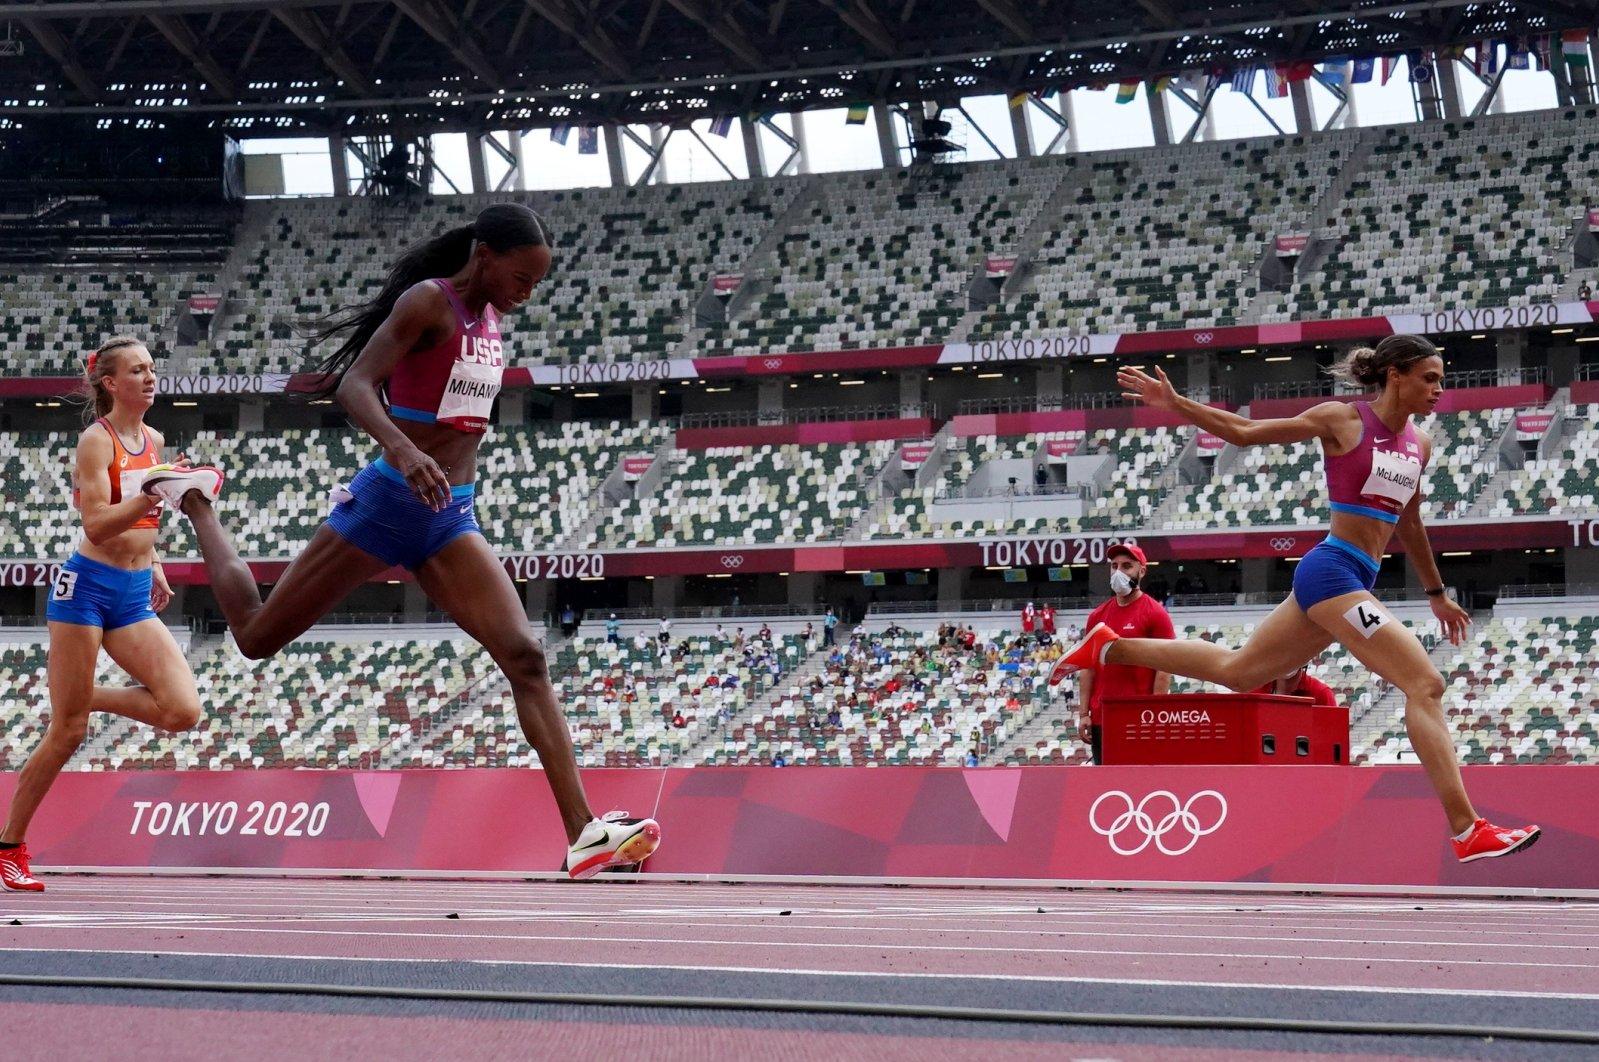 U.S. hurdler Sydney McLaughlin (R) crosses the finish line to win 400-meter hurdles gold at the Tokyo 2020 Olympics, Olympic Stadium, Tokyo, Japan, Aug. 4, 2021. (Reuters Photo)